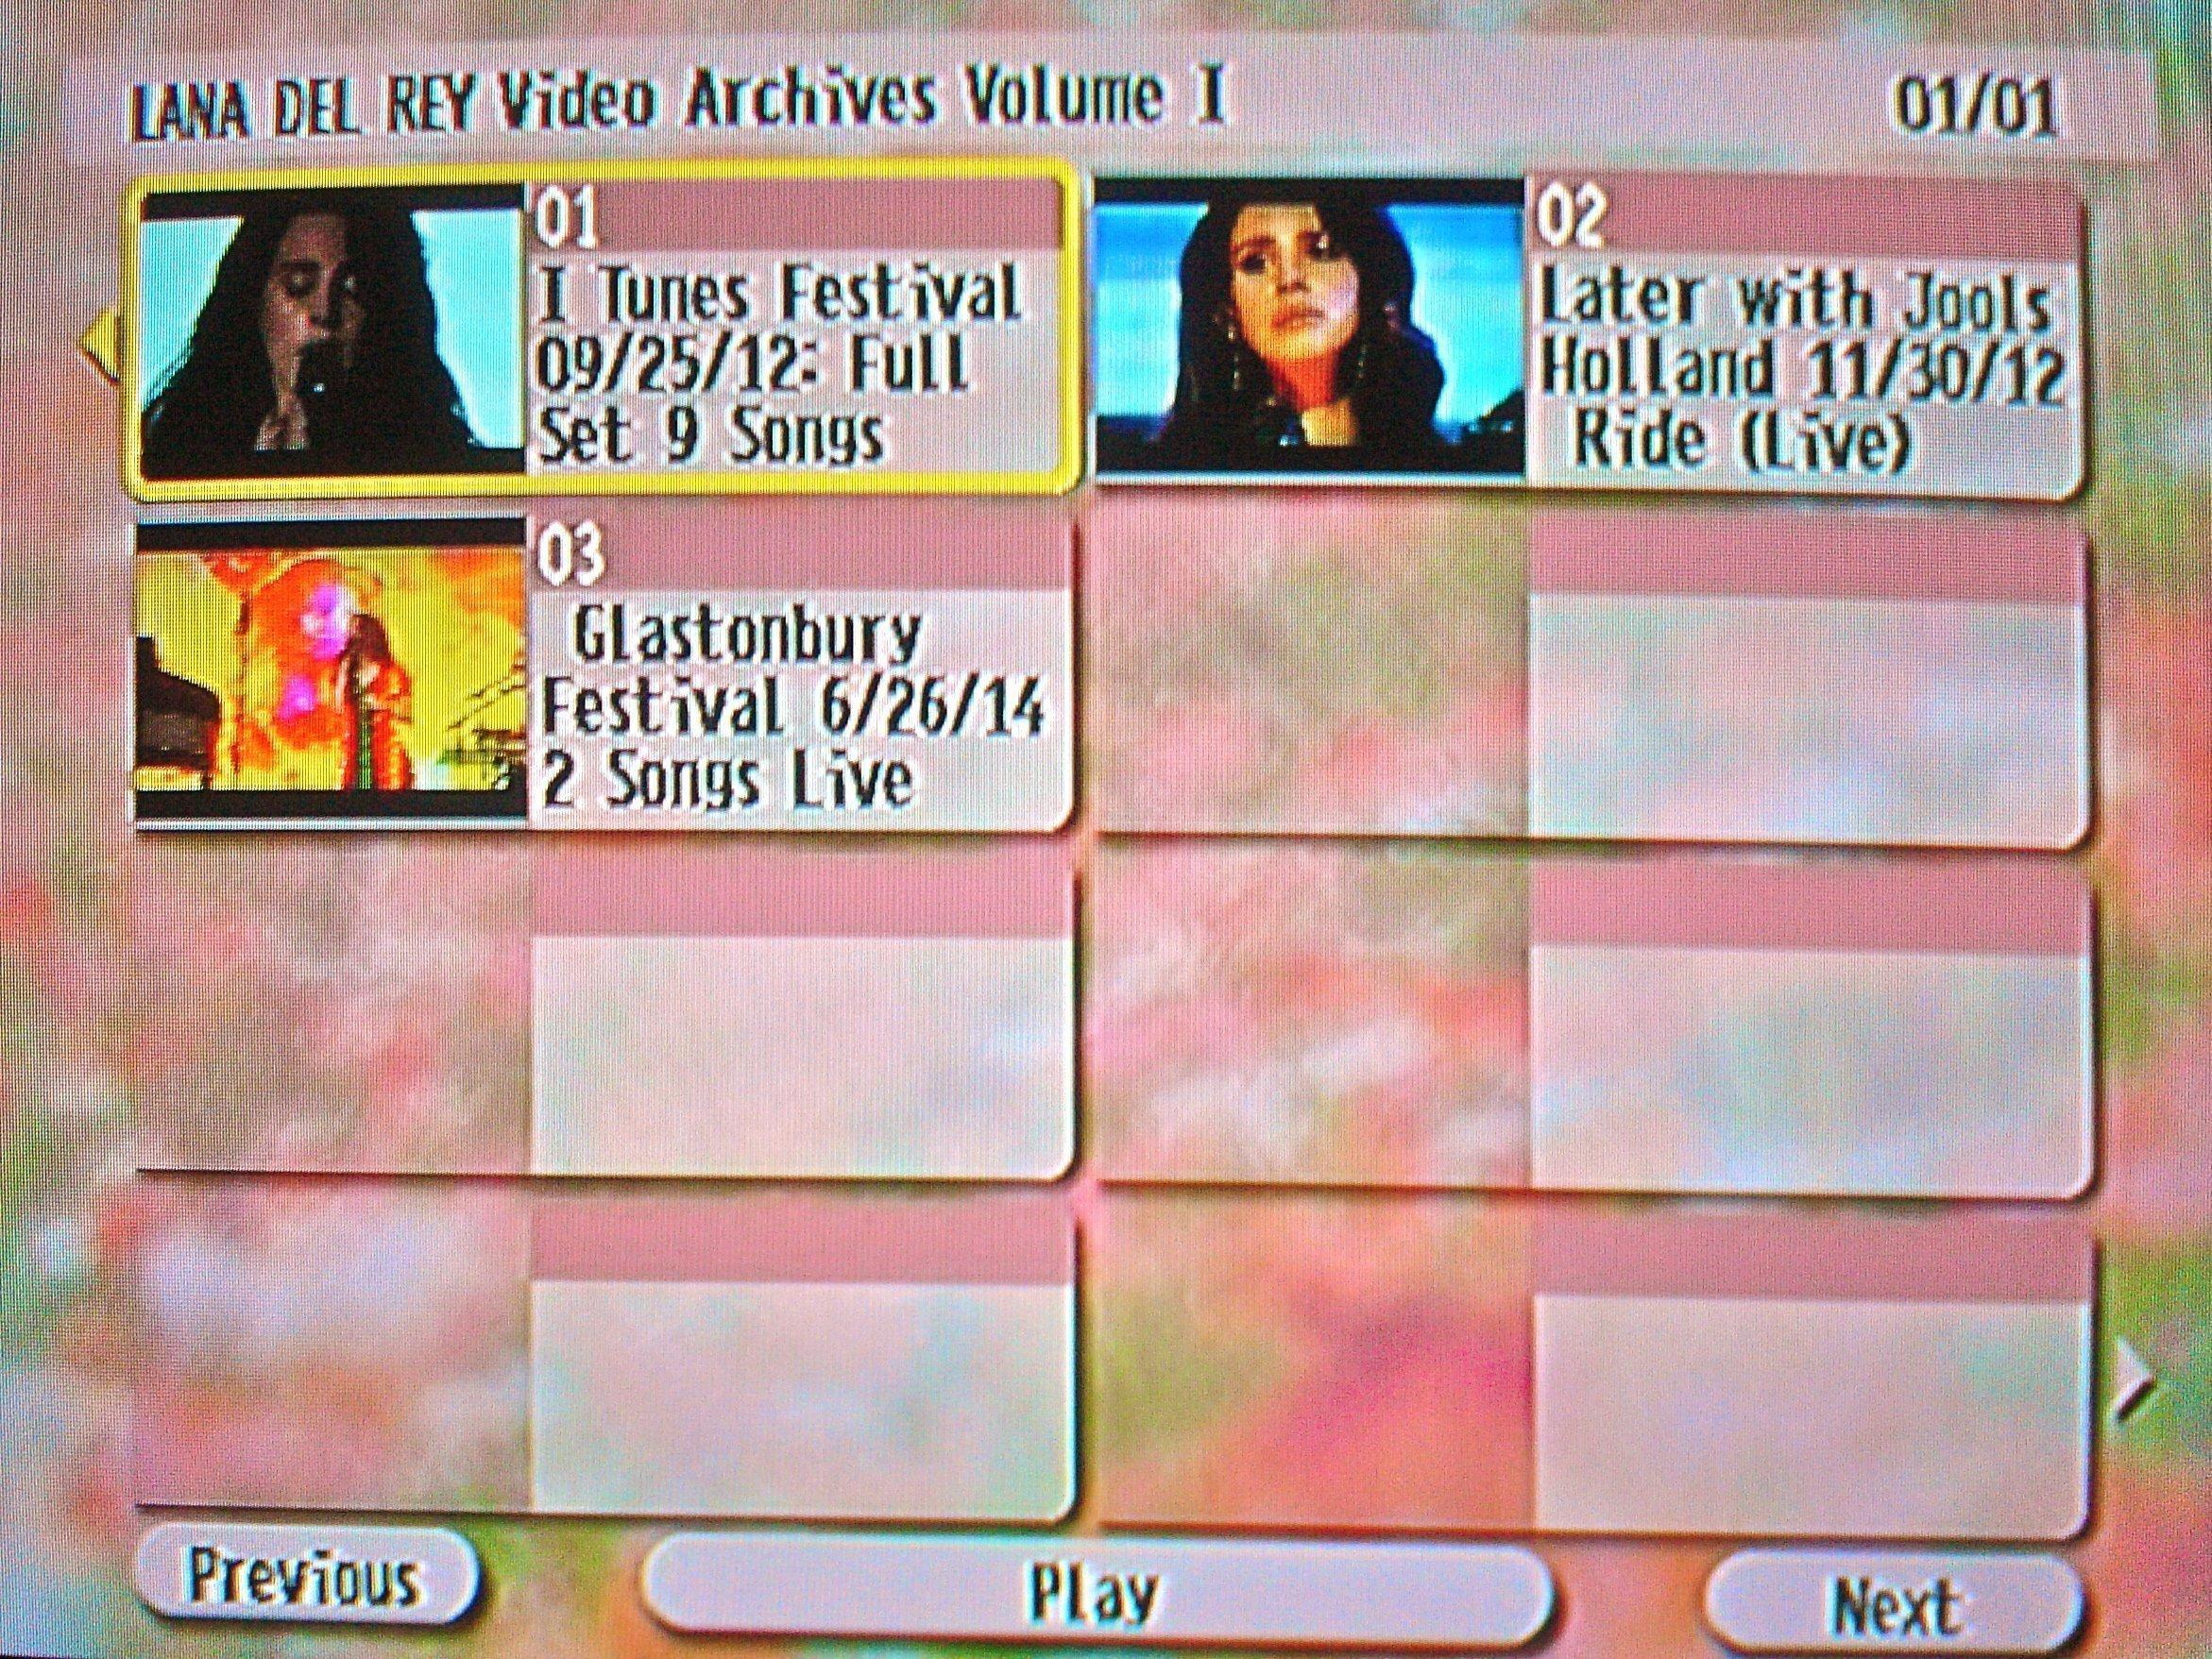 LANA DEL REY The LIVE Video Archives 2012-2014 Volume I